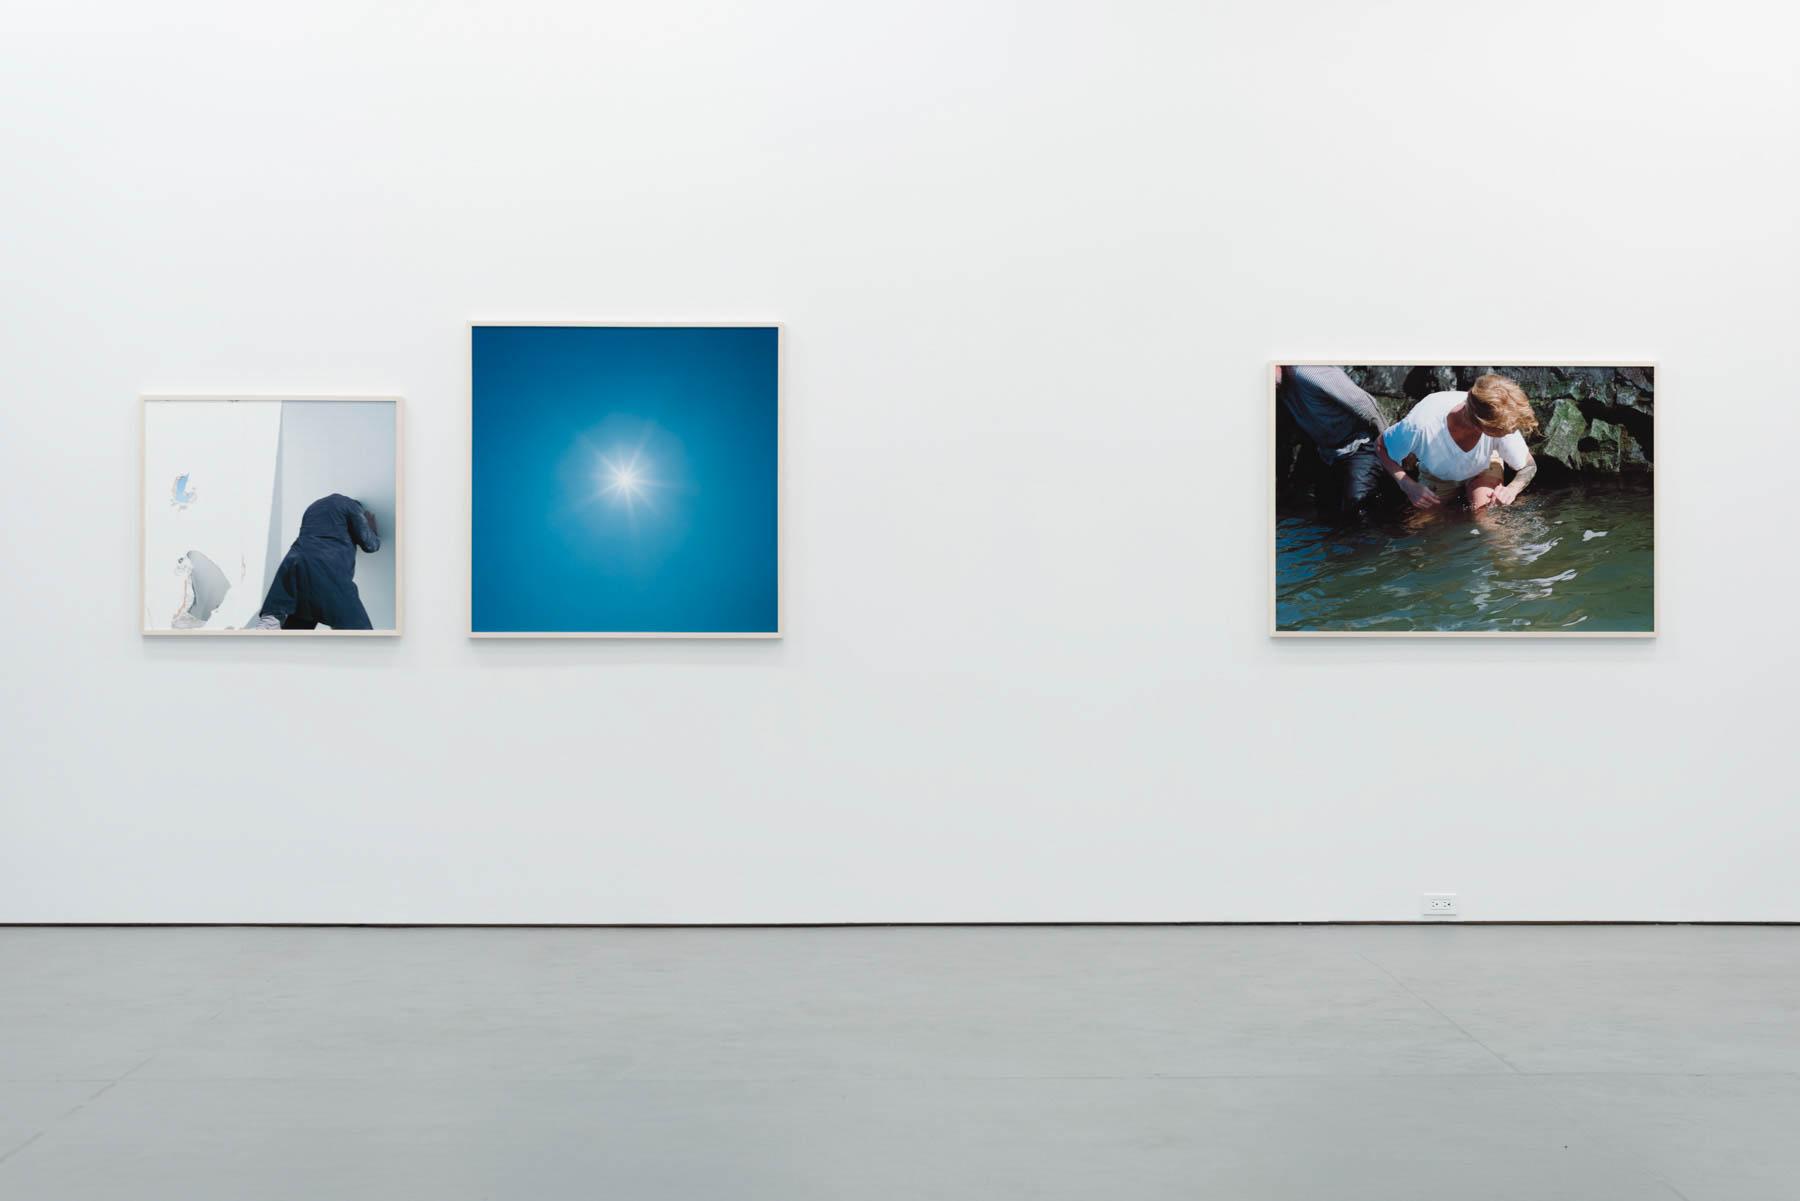 Jacinthe Carrier, brise glace soleil blanc, 2016, vue d'exposition, @ Galerie Antoine Ertaskiran, photo: Paul Litherland.